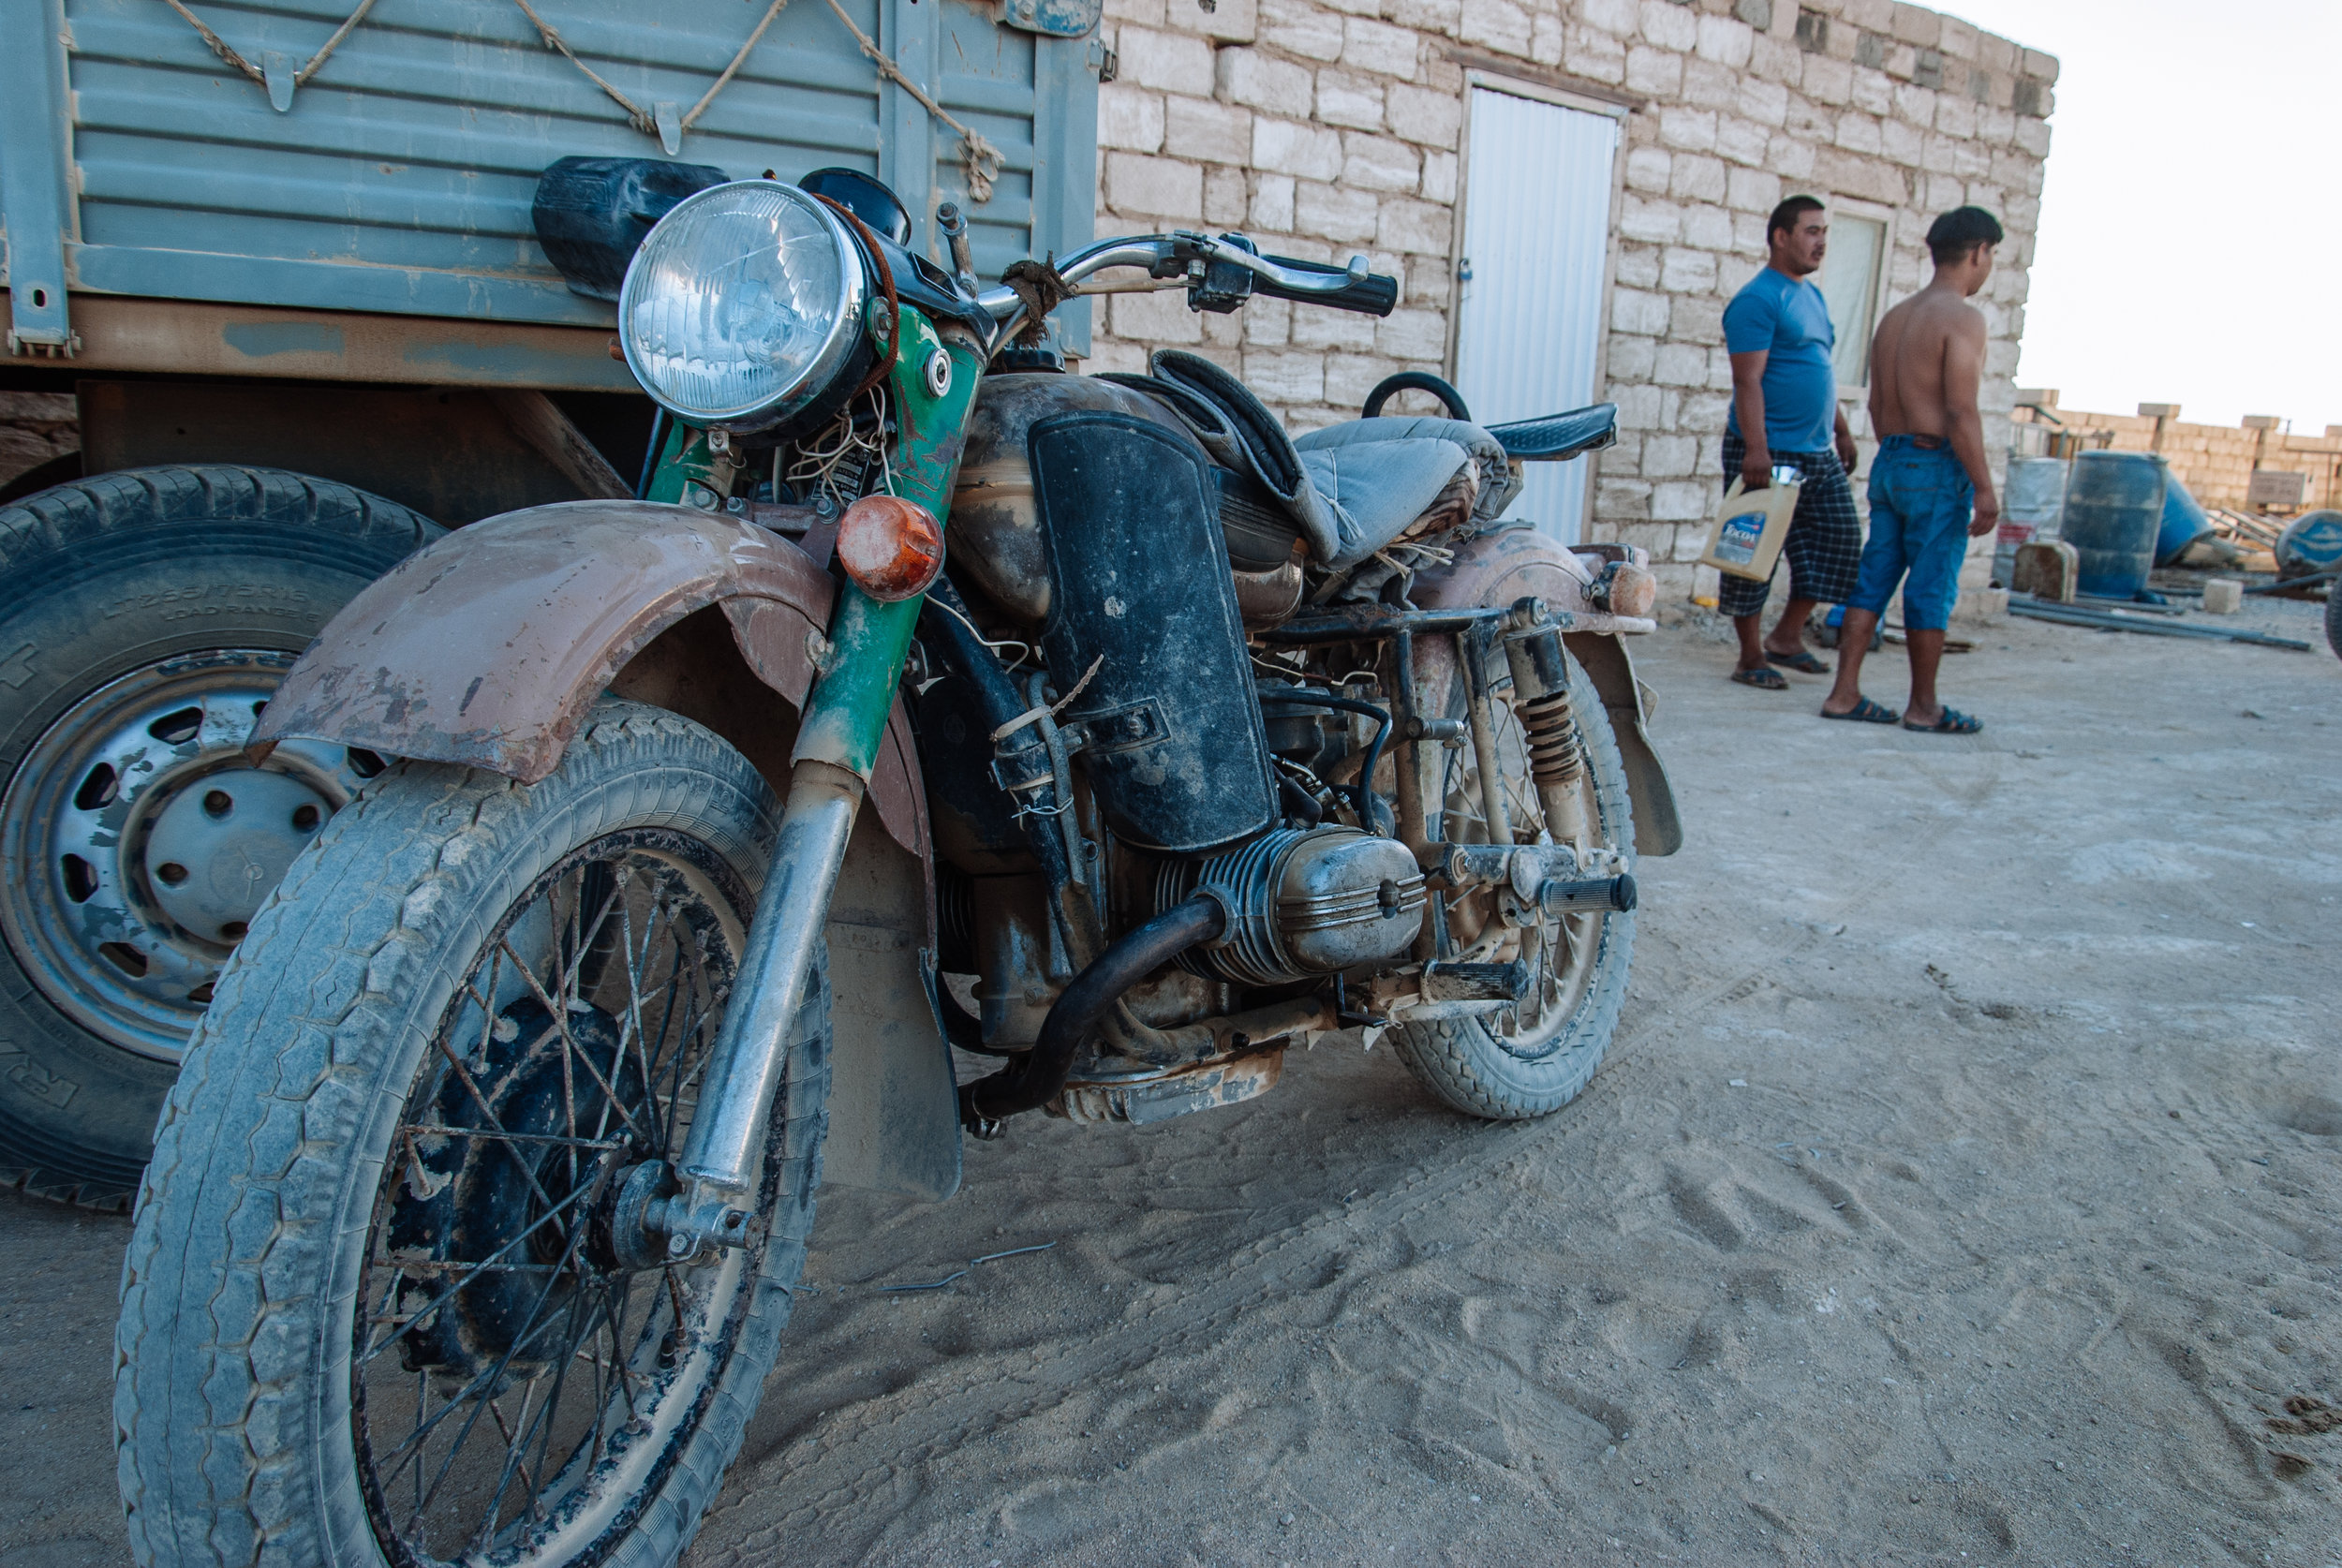 Ural motorbike